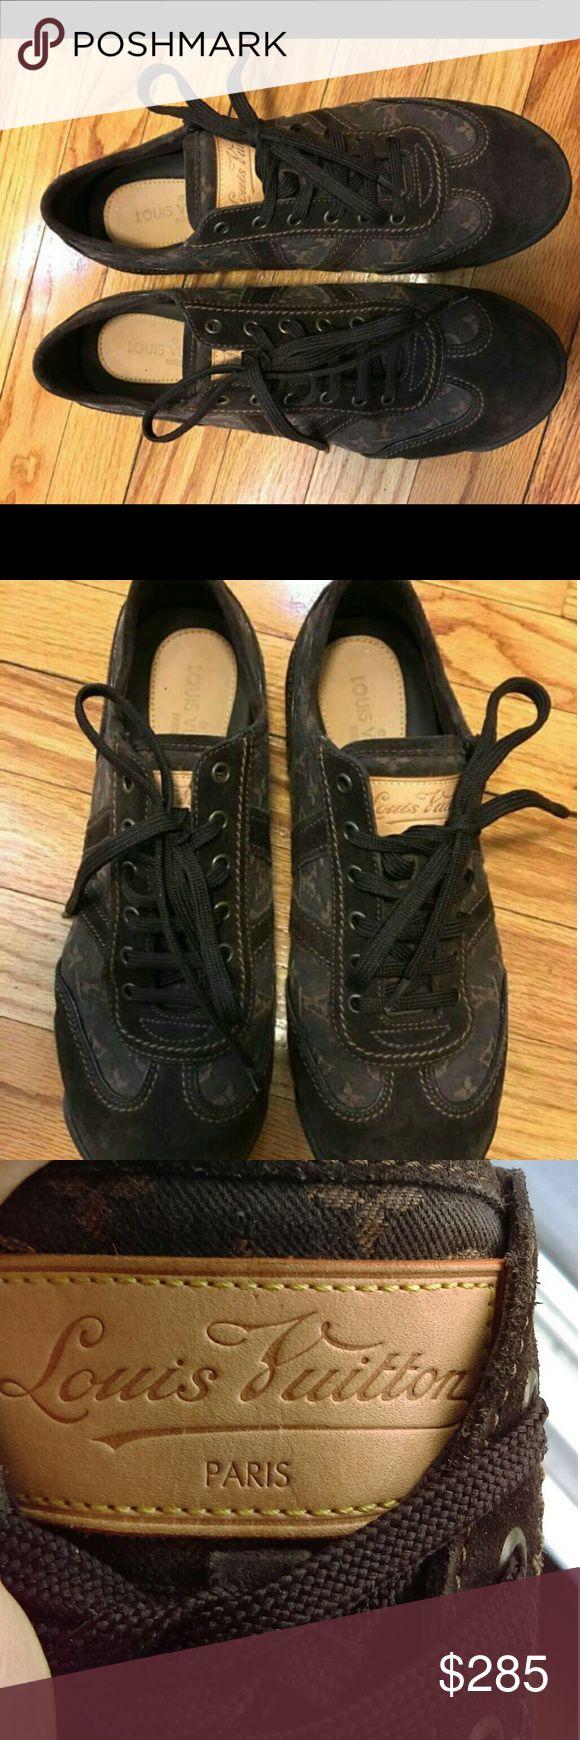 Louis Vuitton Denim/suede monogrammed sneakers 8 Mark Jacob's era Louis Vuitton Denim/suede monogrammed sneakers 8 men's US 7UK. Excellent used condition. Louis Vuitton Shoes Sneakers